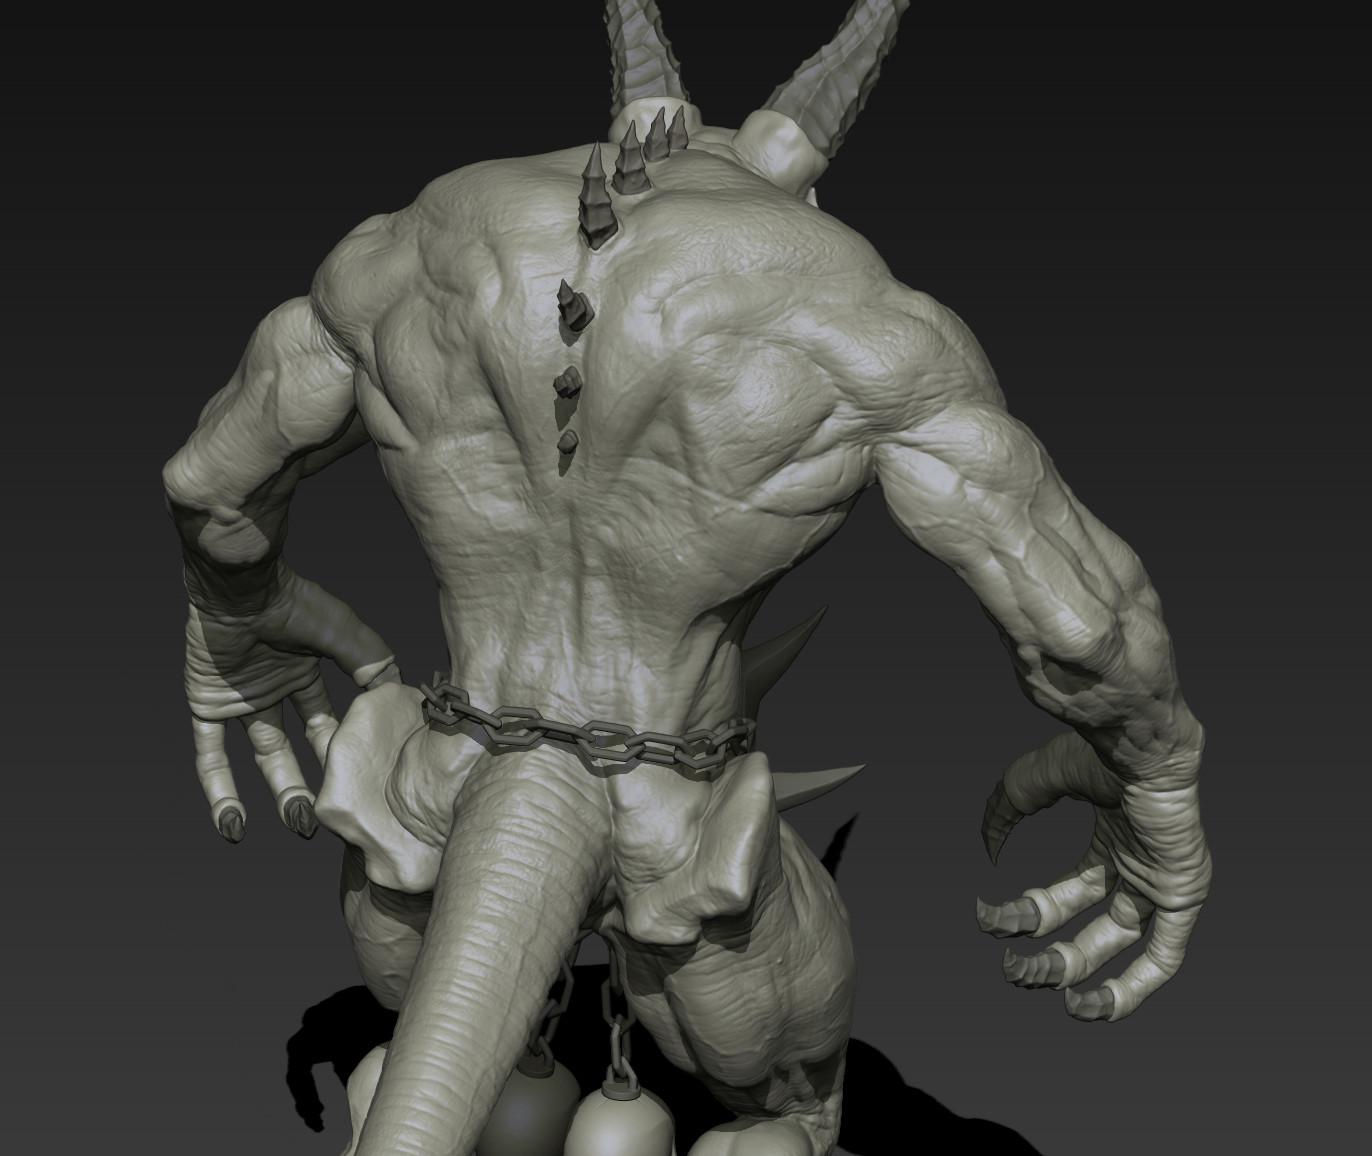 Toby hynes demon 04